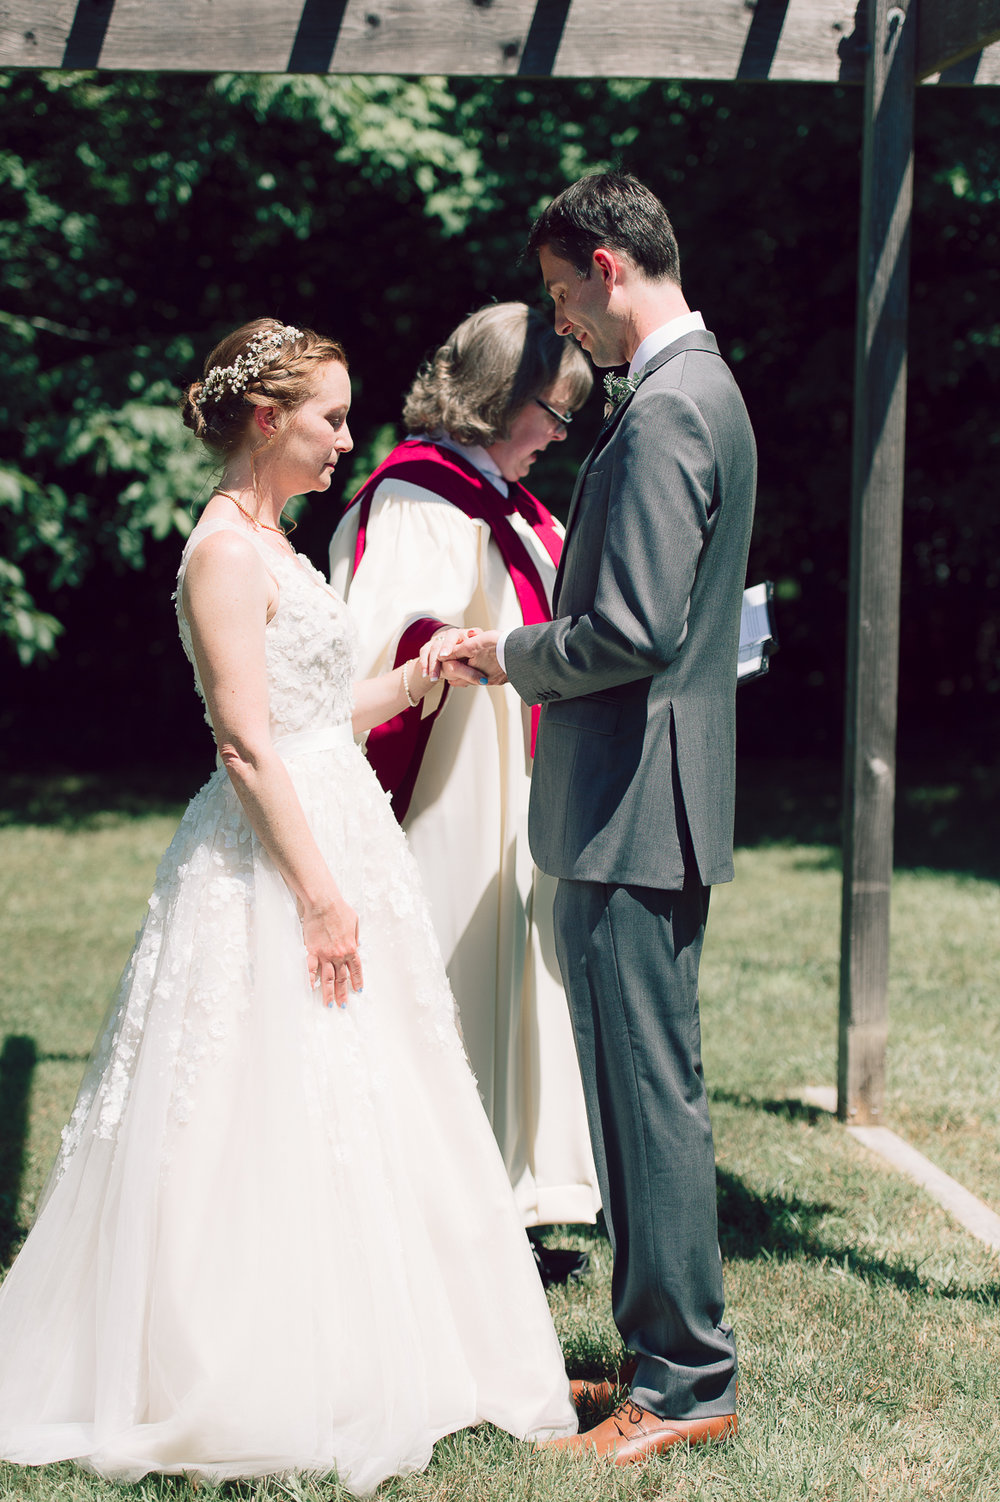 virginiawedding_theGlasgowFarm_rusticwedding_fredericksburg_youseephotography_CarolineDale (40).jpg